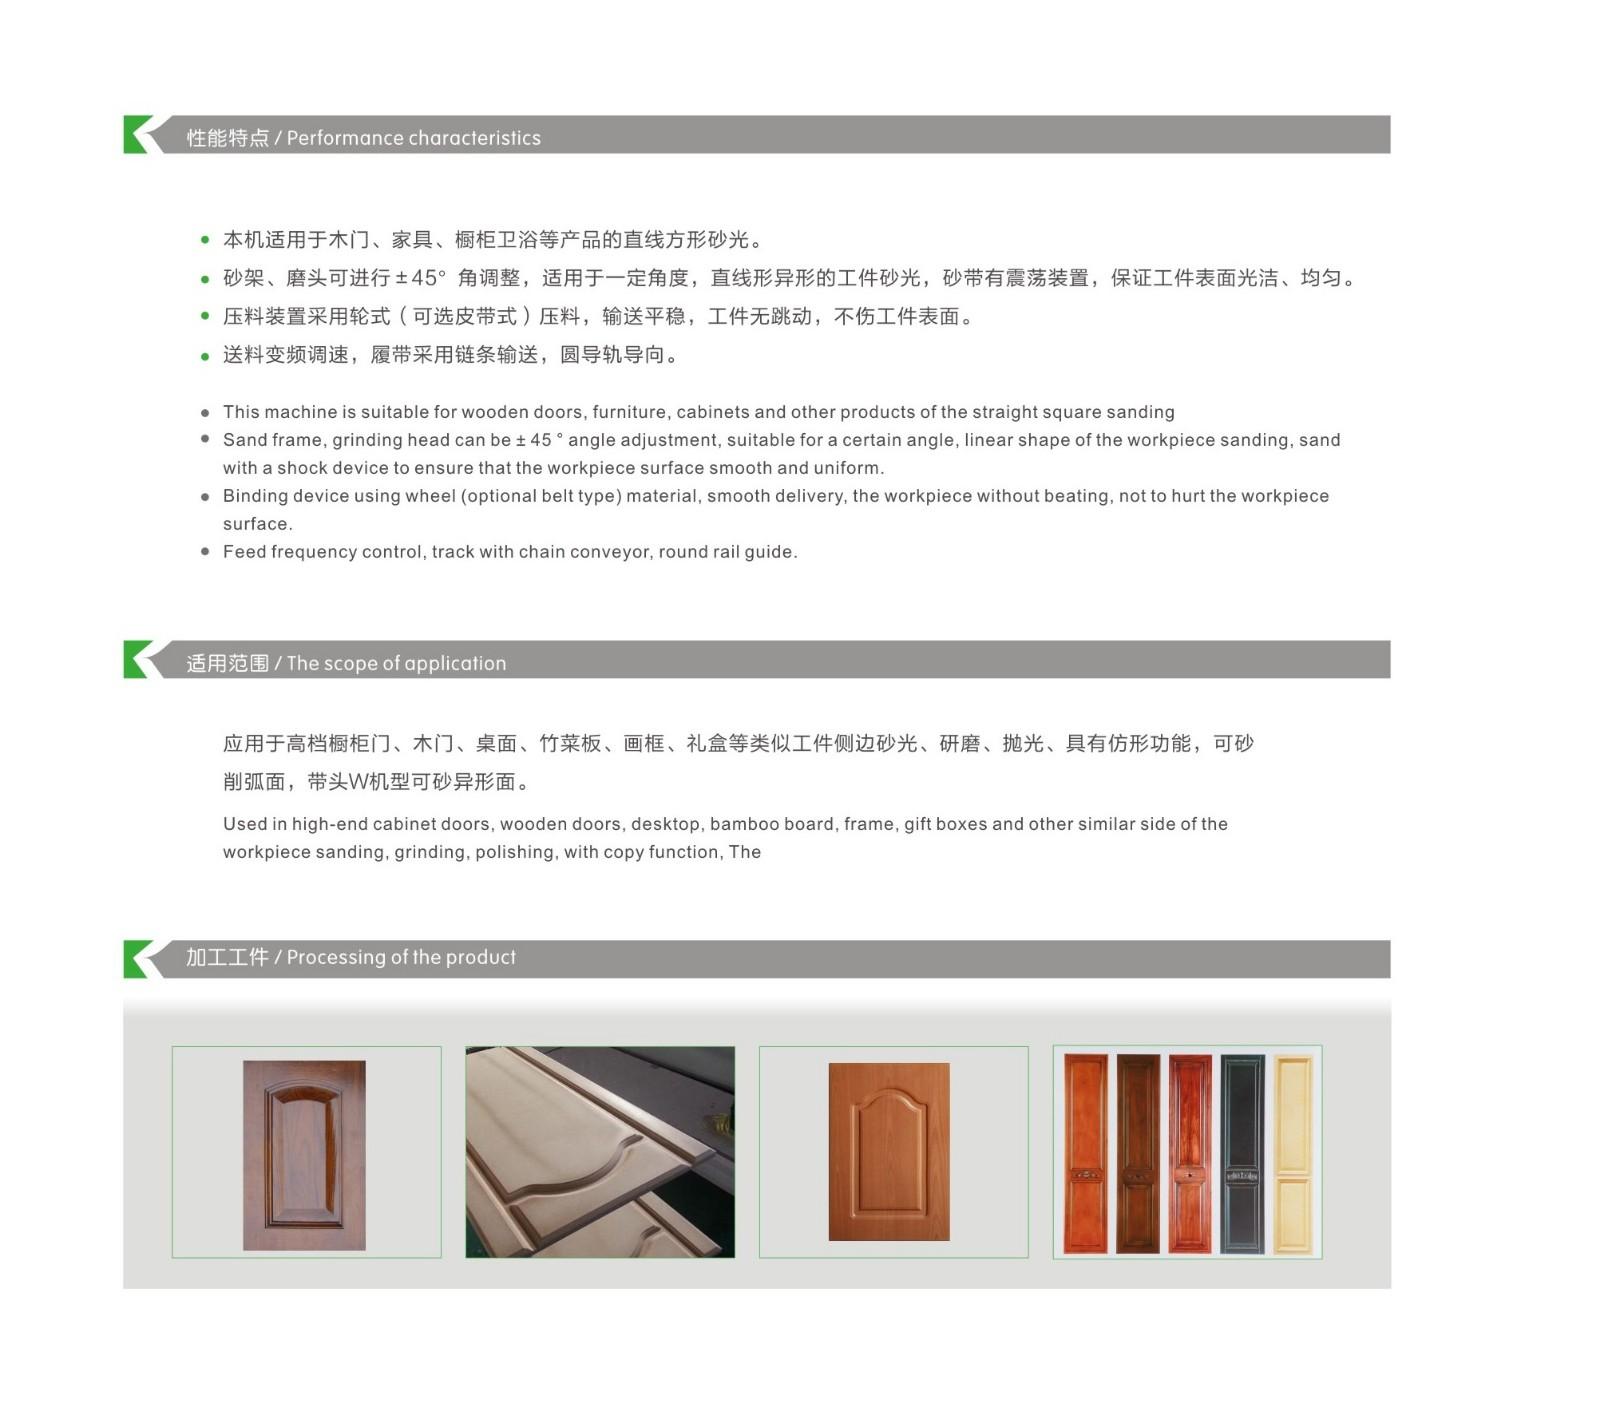 Muwei hard curve sliding table saw manufacturer for furniture-5